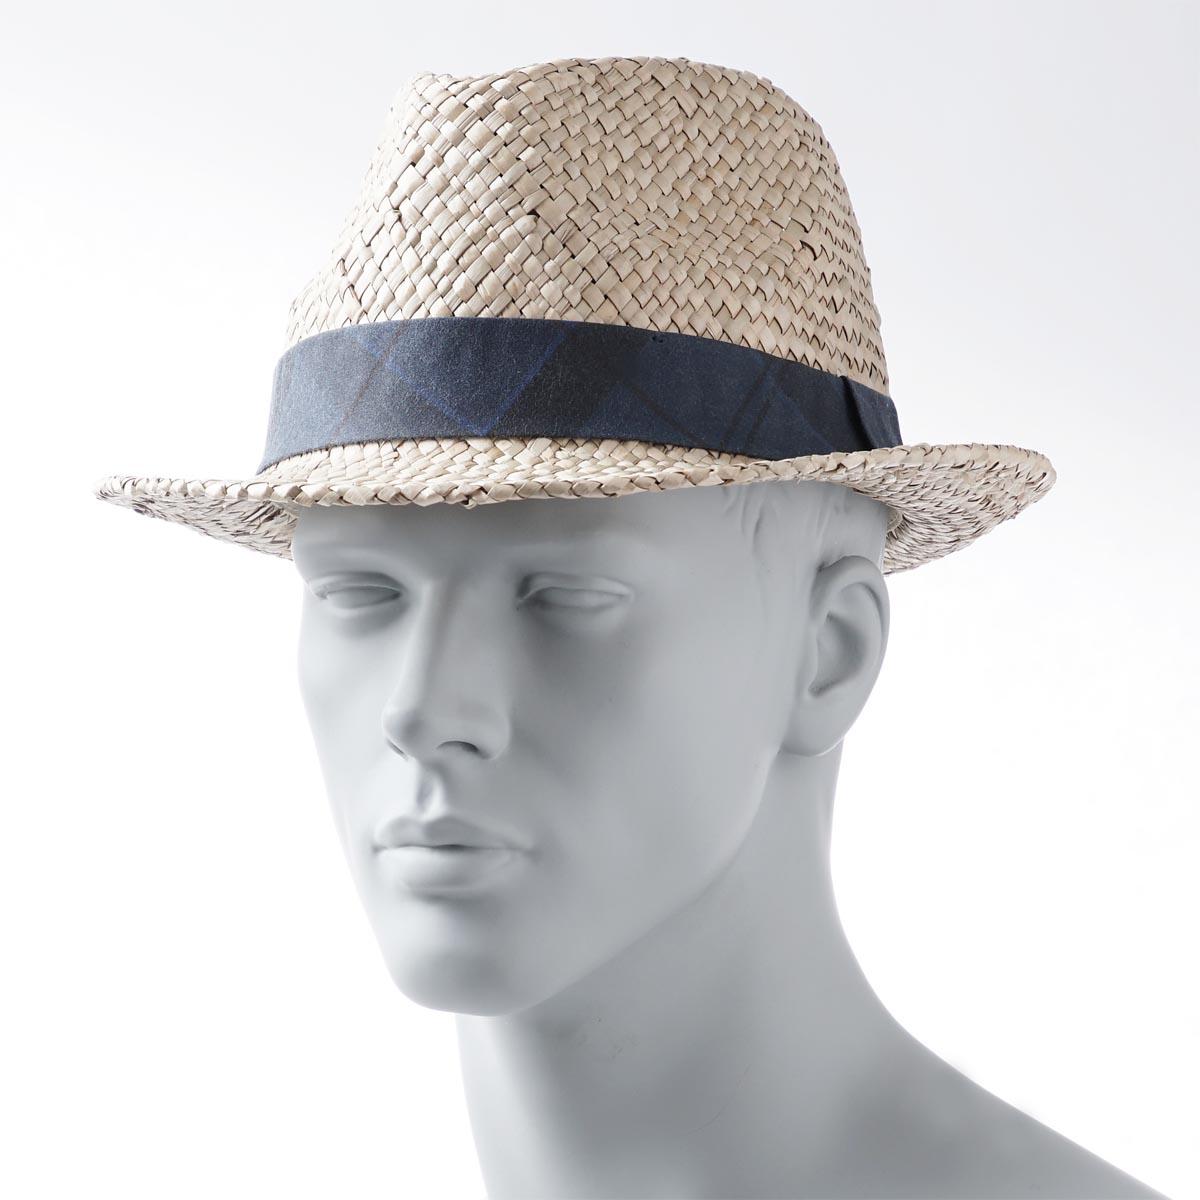 babua Barbour帽子舒适之帽中的去便帽TARTAN TRIMMED TRILBY NATURAL浅驼色派mha0353be11 natural人